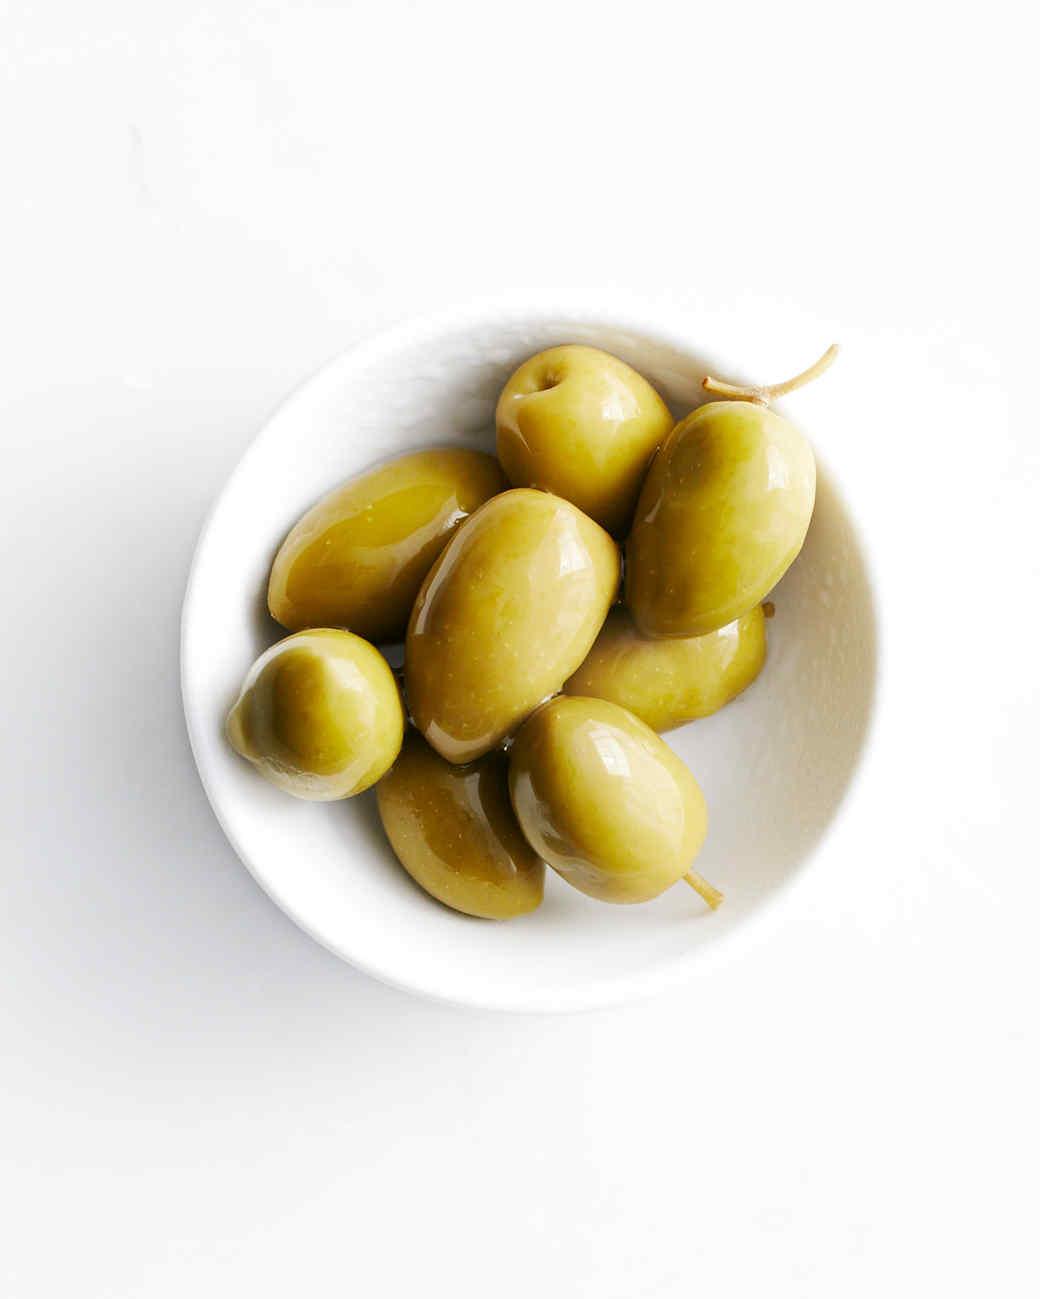 olive-ipad-picholine-0101-ld110630-0614.jpg